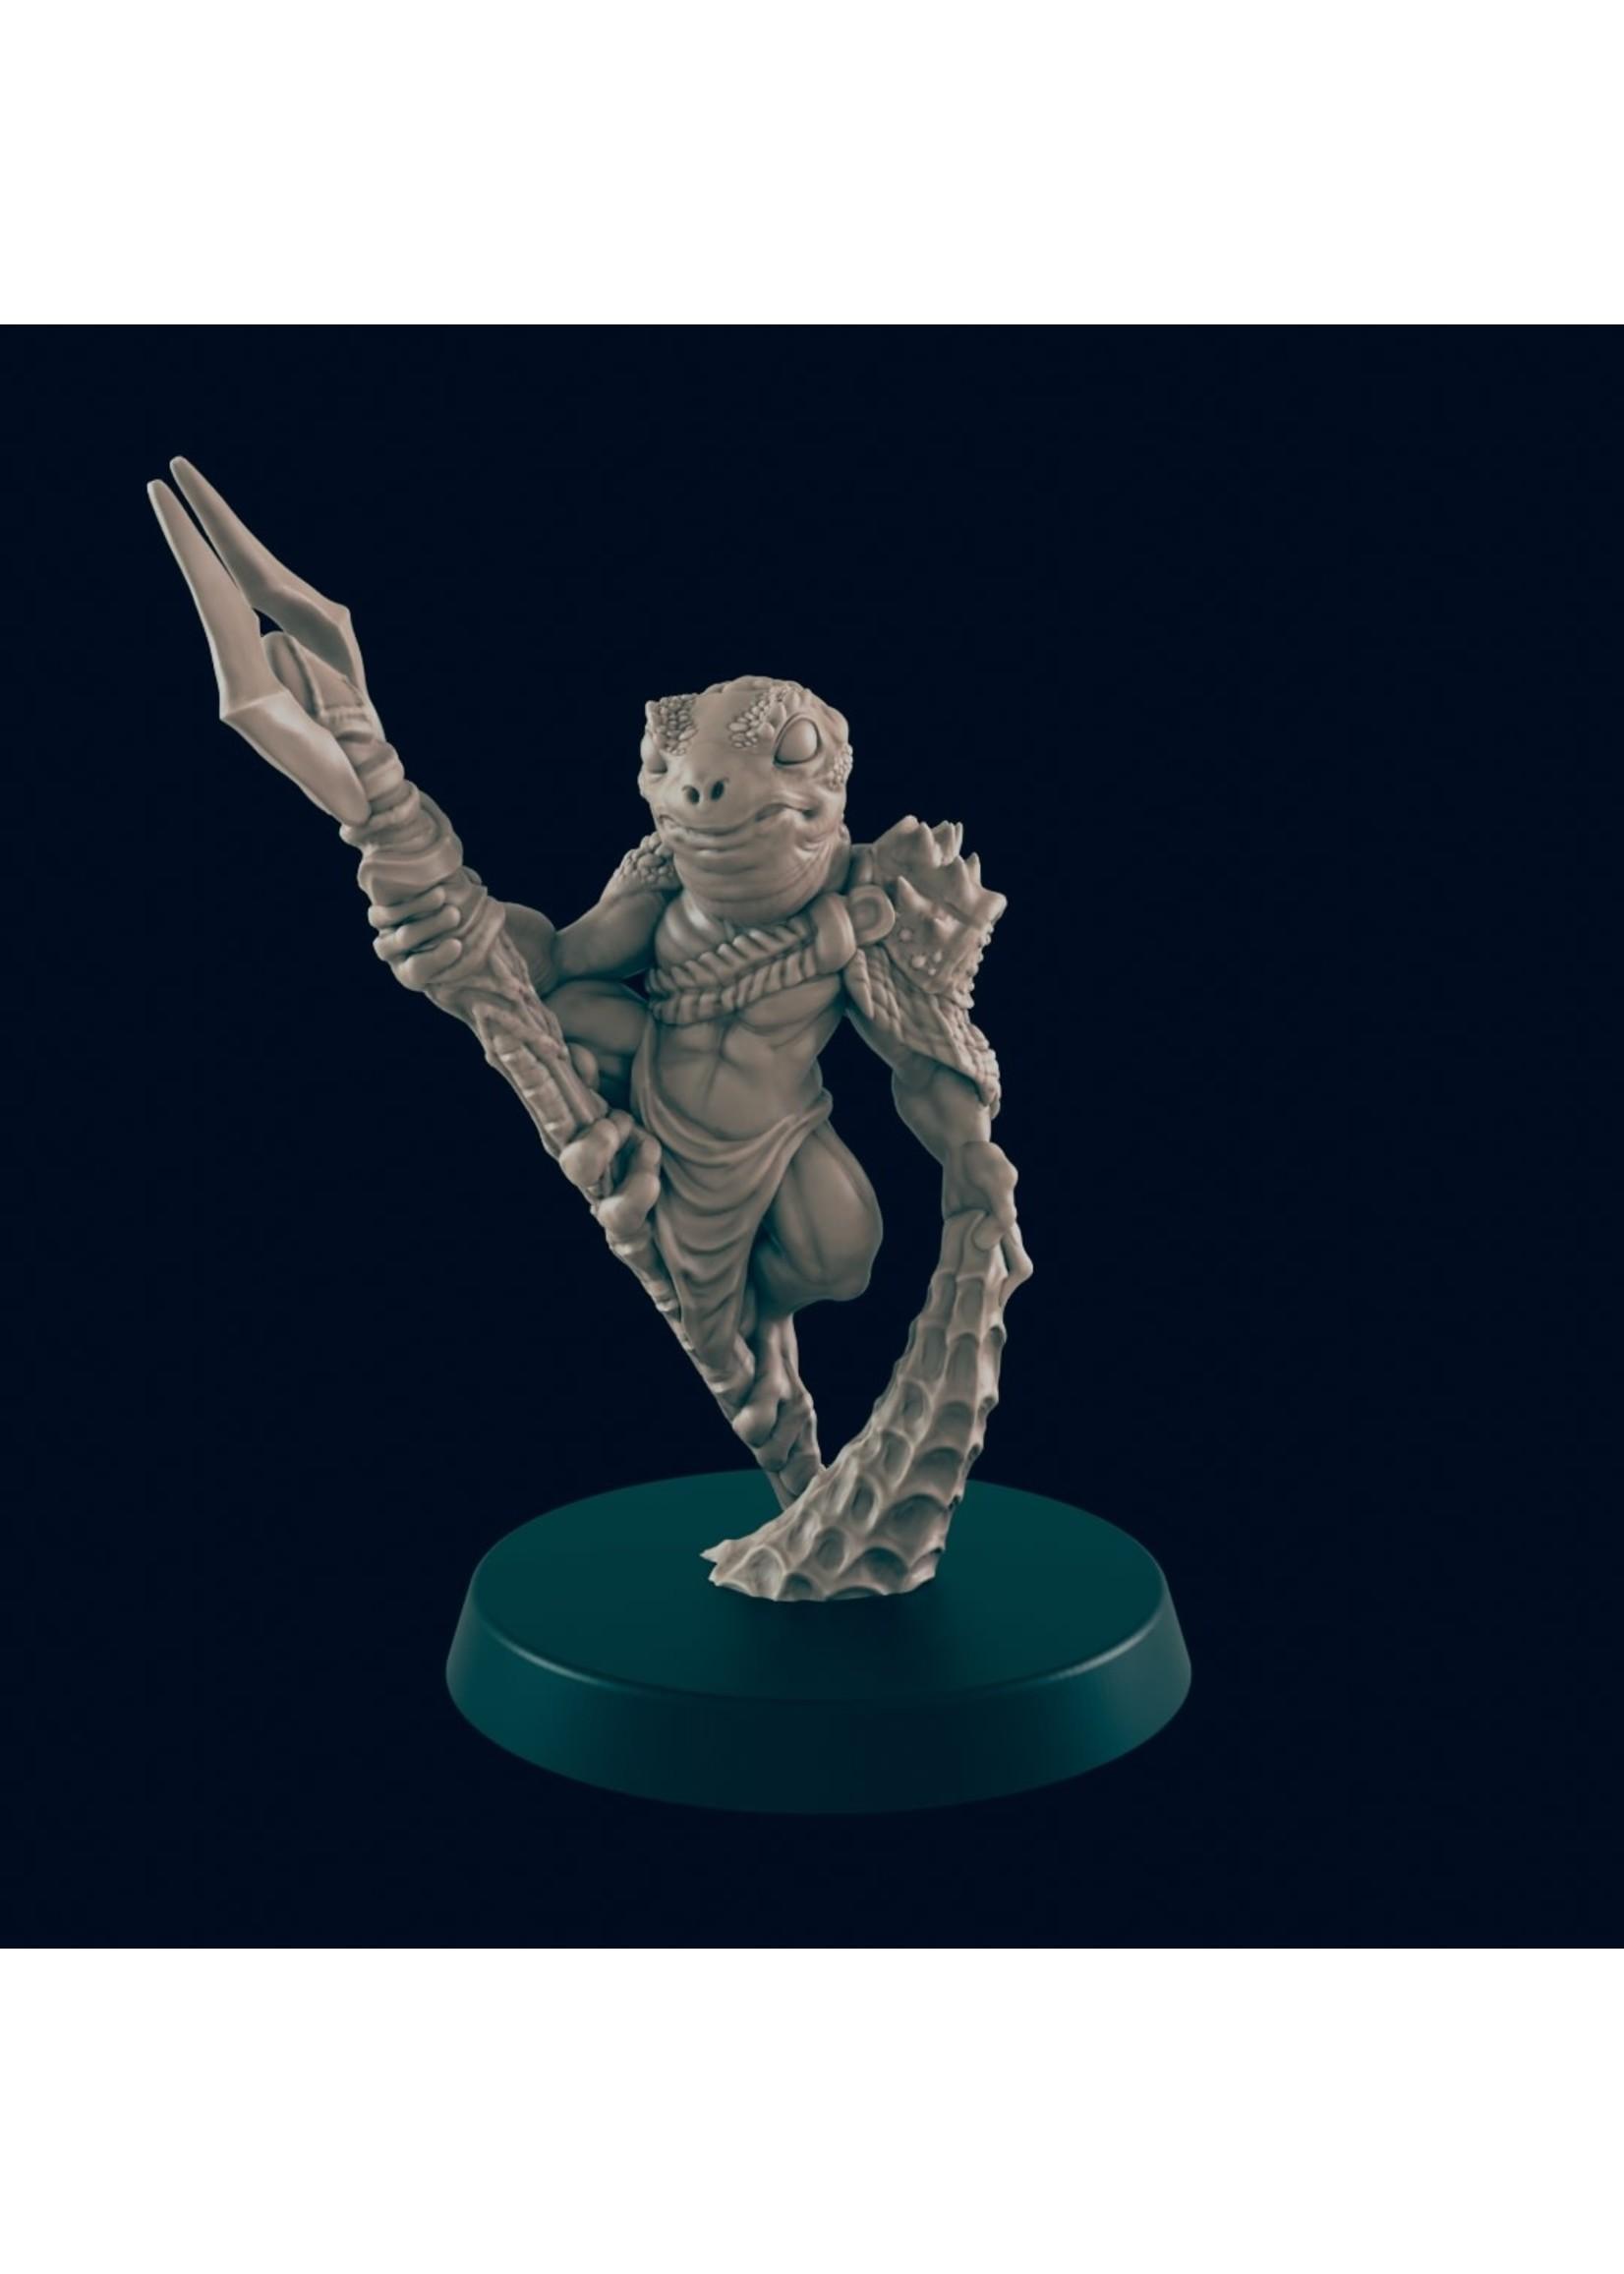 3D Printed Miniature - Bullywug Ranger  - Dungeons & Dragons - Beasts and Baddies